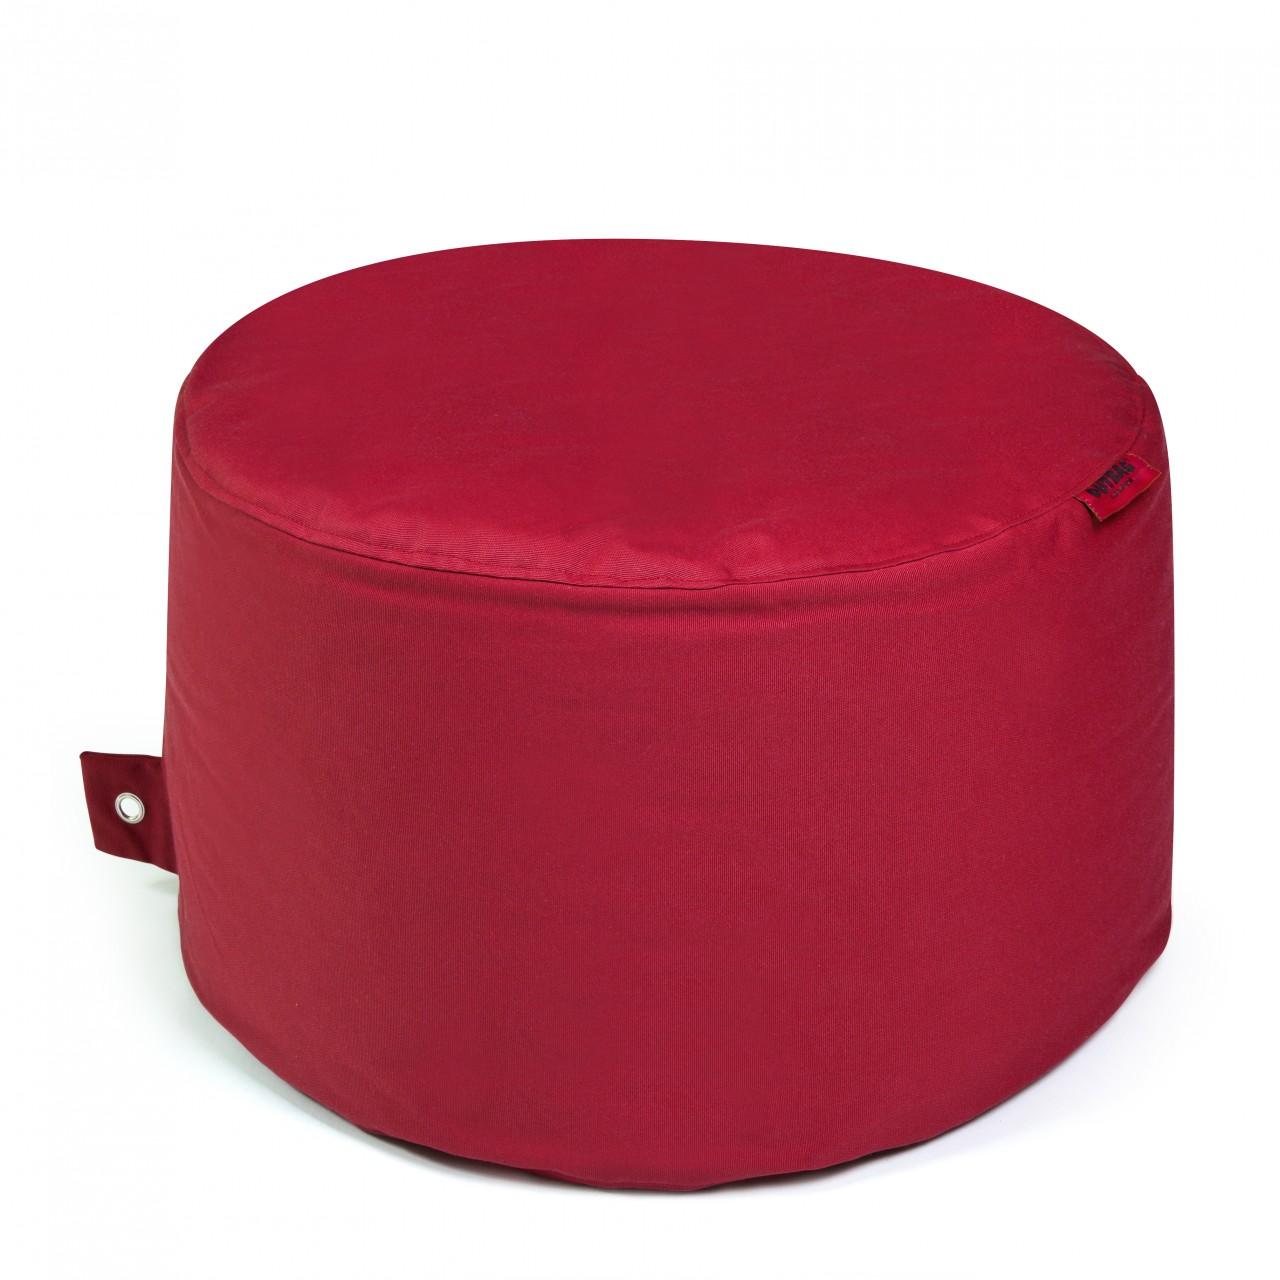 Outdoor Sitzsack ROCK Ø 60 cm wetterfest Plus Red